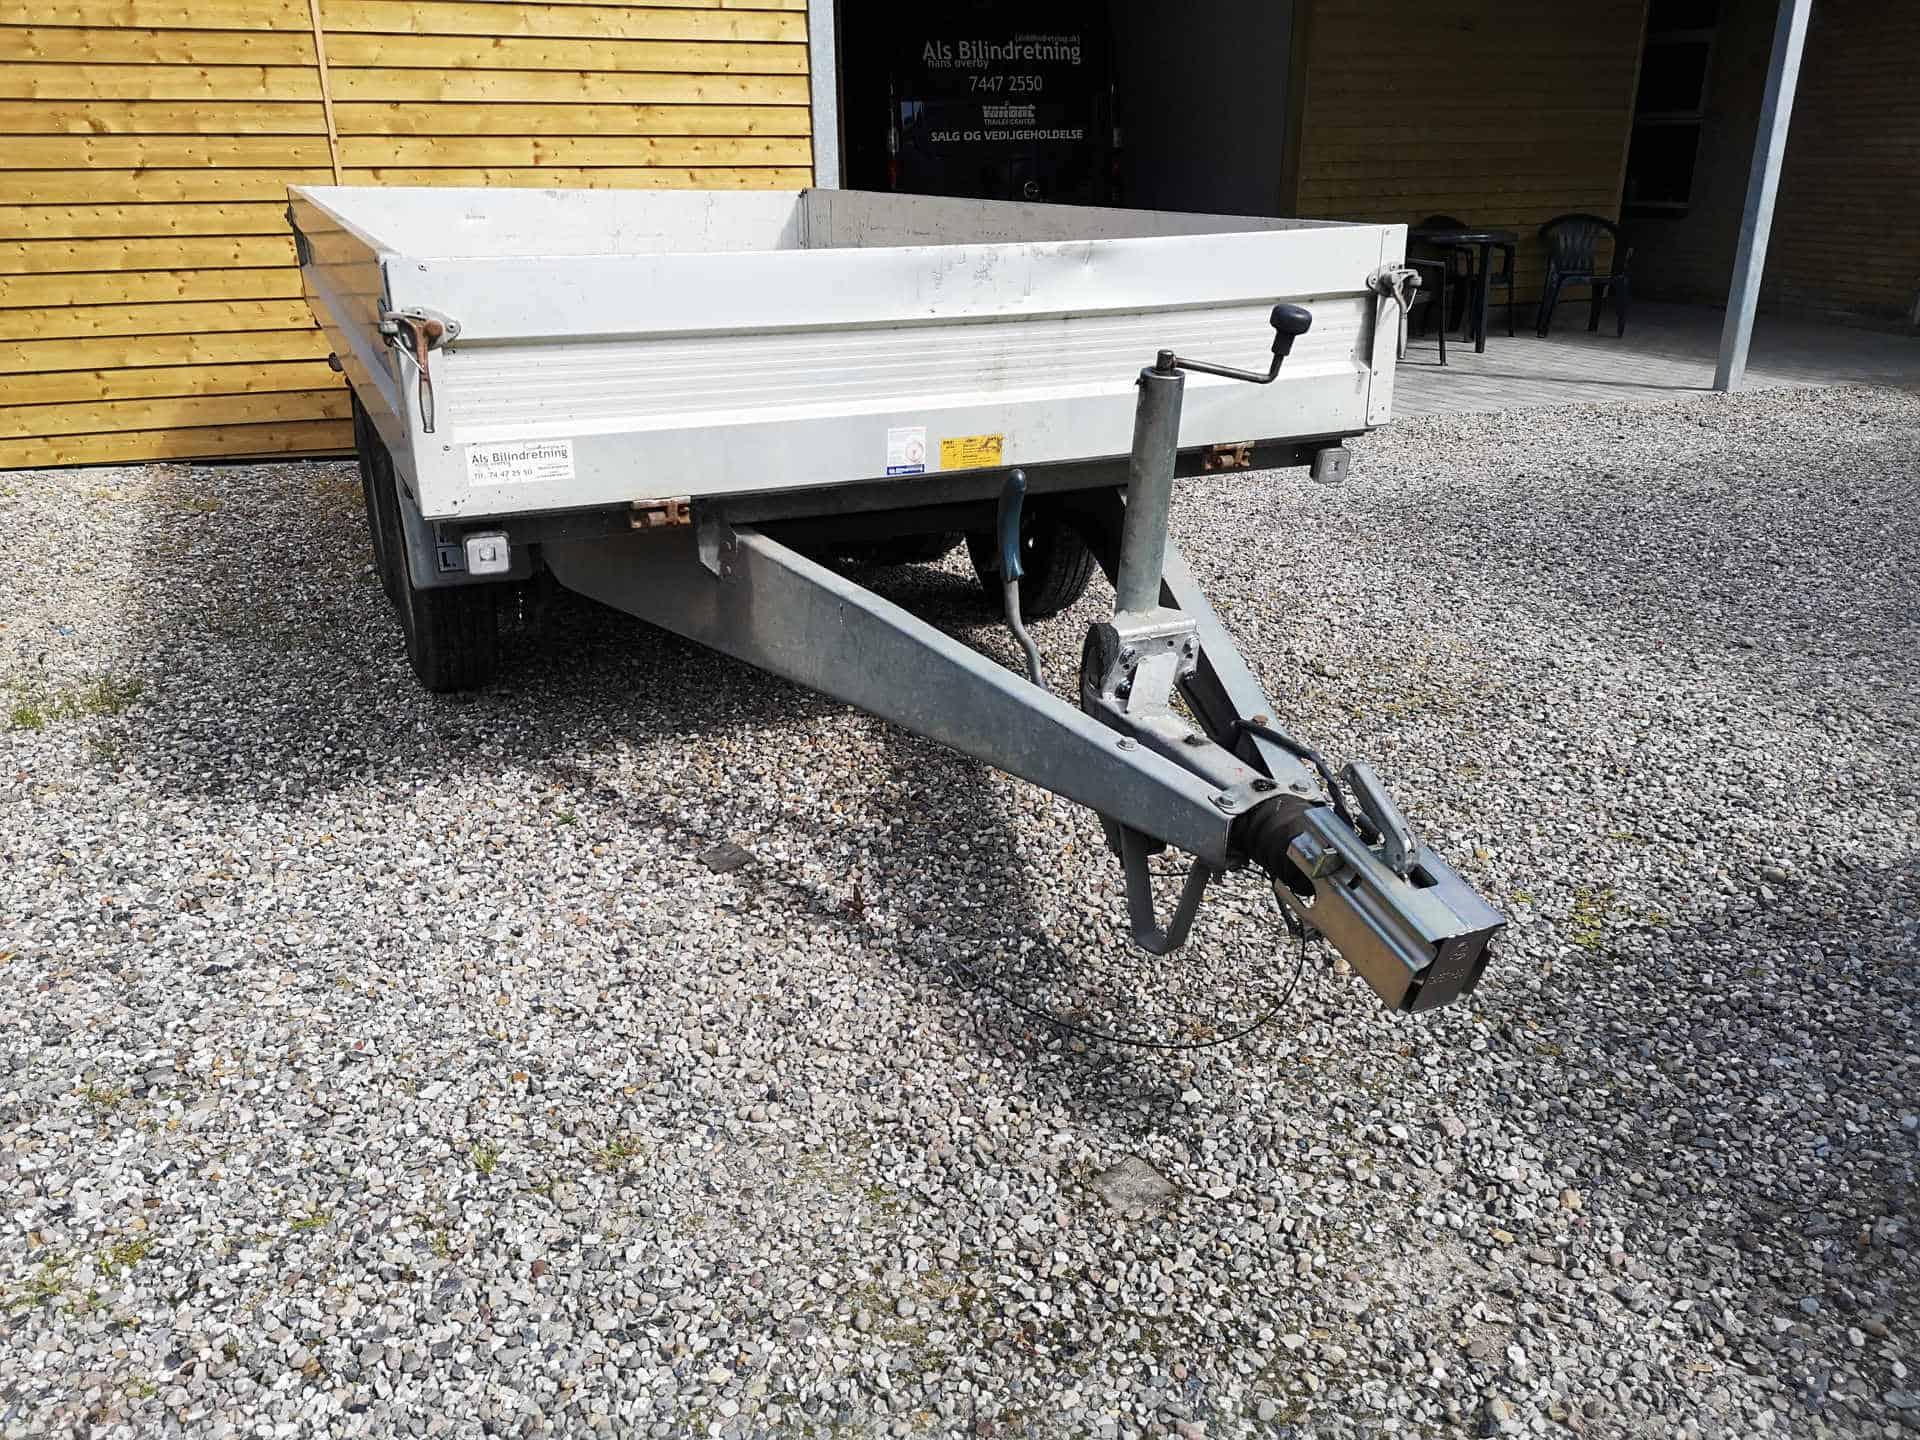 Variant 2006 B 320 Alu trailer - årgang 2012 - Nysynet